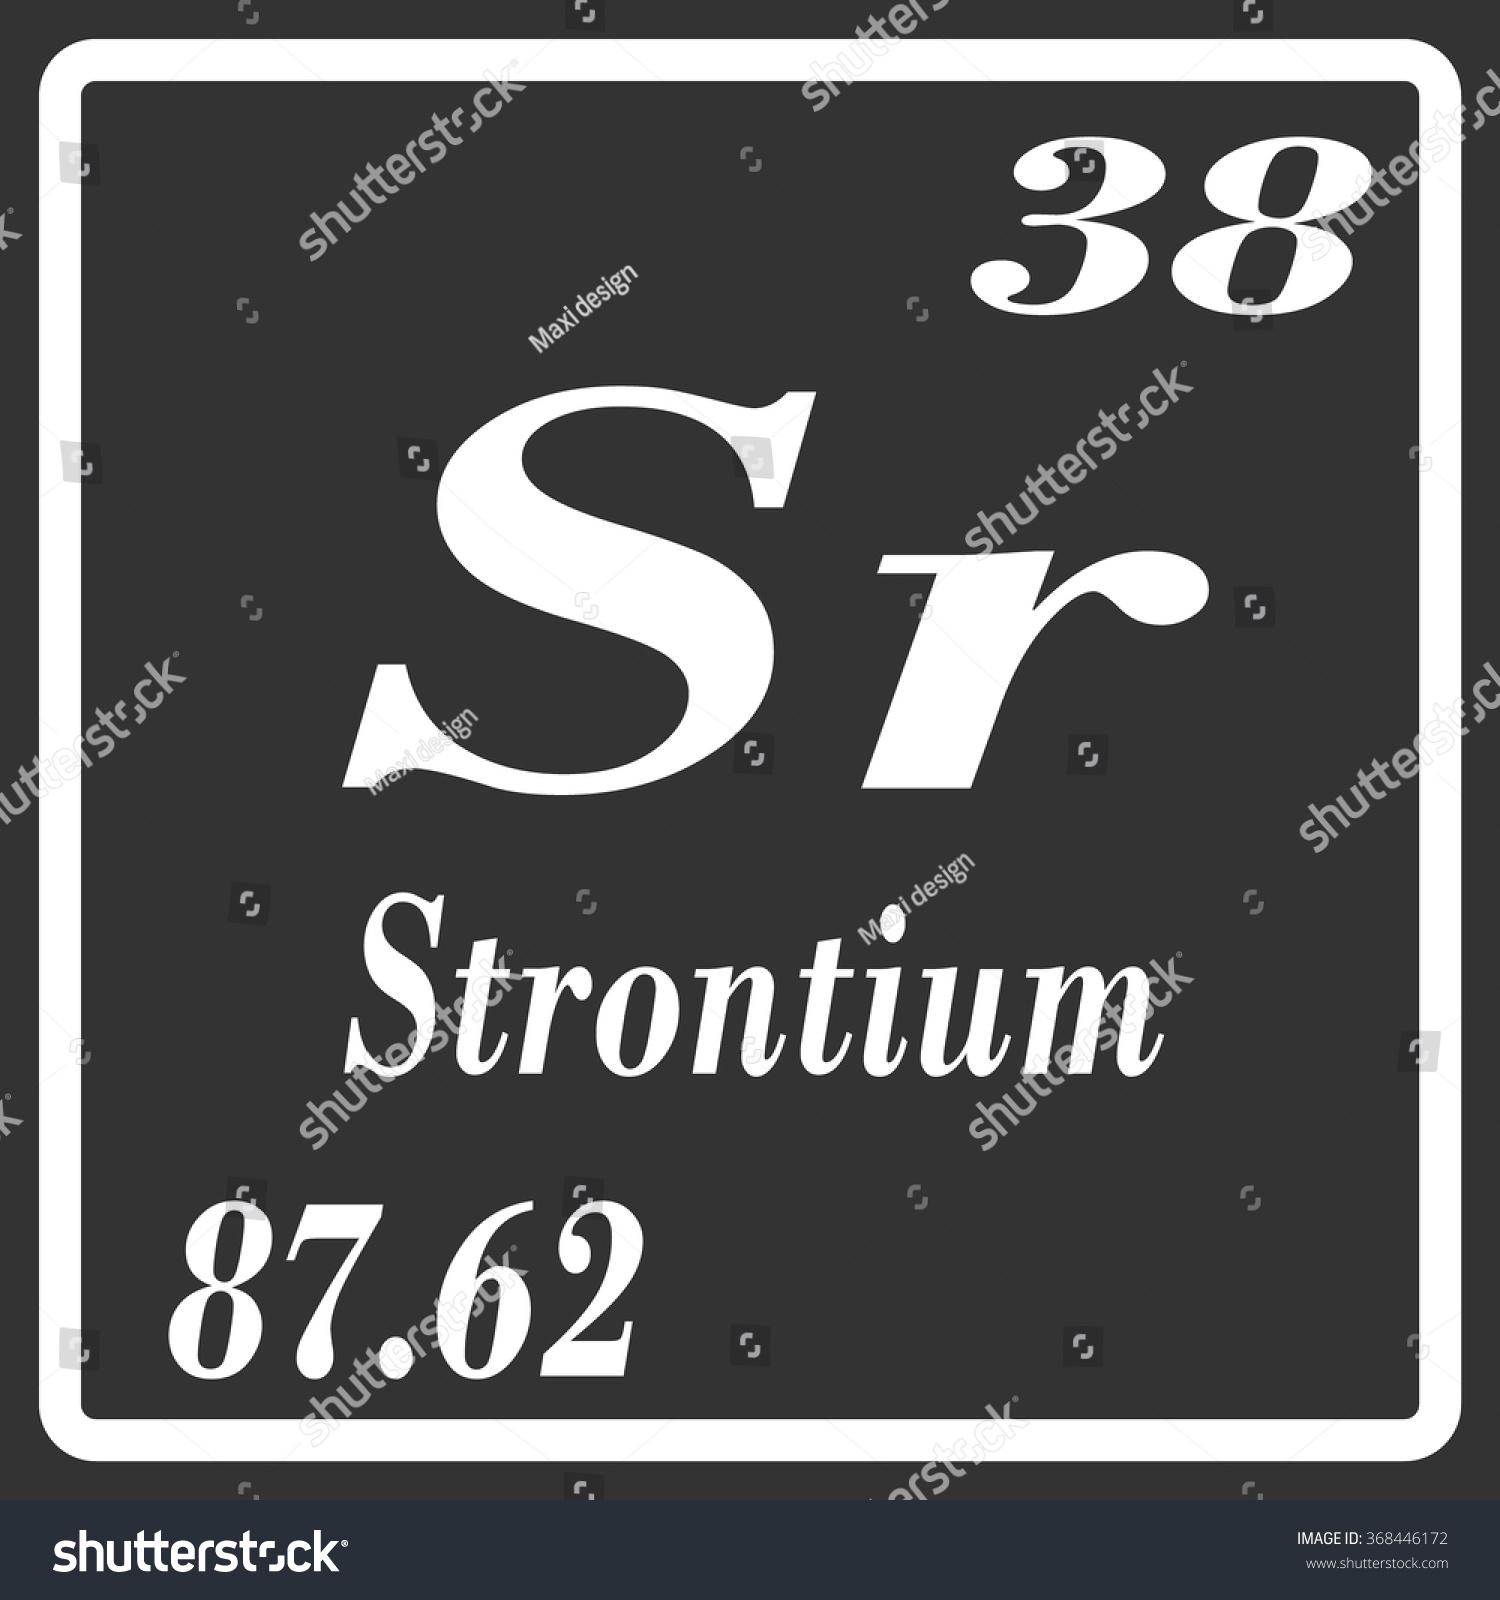 Periodic table uh gallery periodic table images strontium on periodic table images periodic table images is kryptonite on the periodic table choice image gamestrikefo Gallery